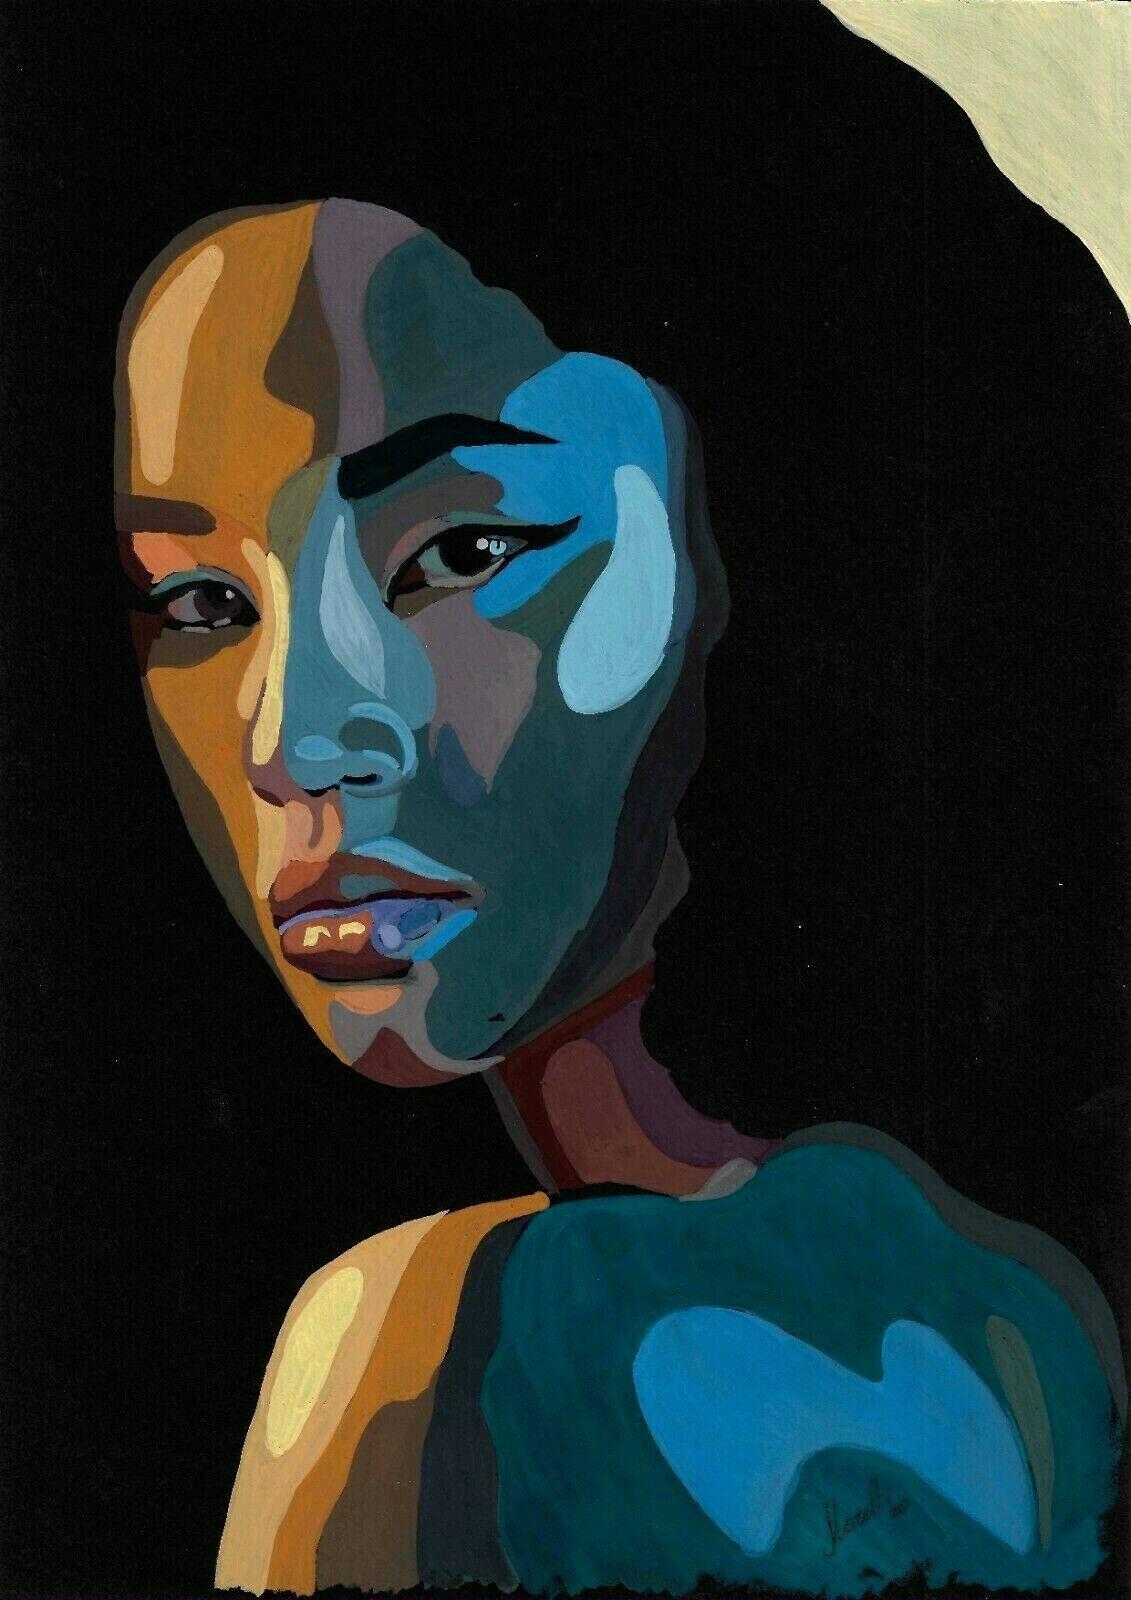 Original Drawing A4 40BJ Art Samovar Mixed Media Modern Female Portrait 2020 - $1.25